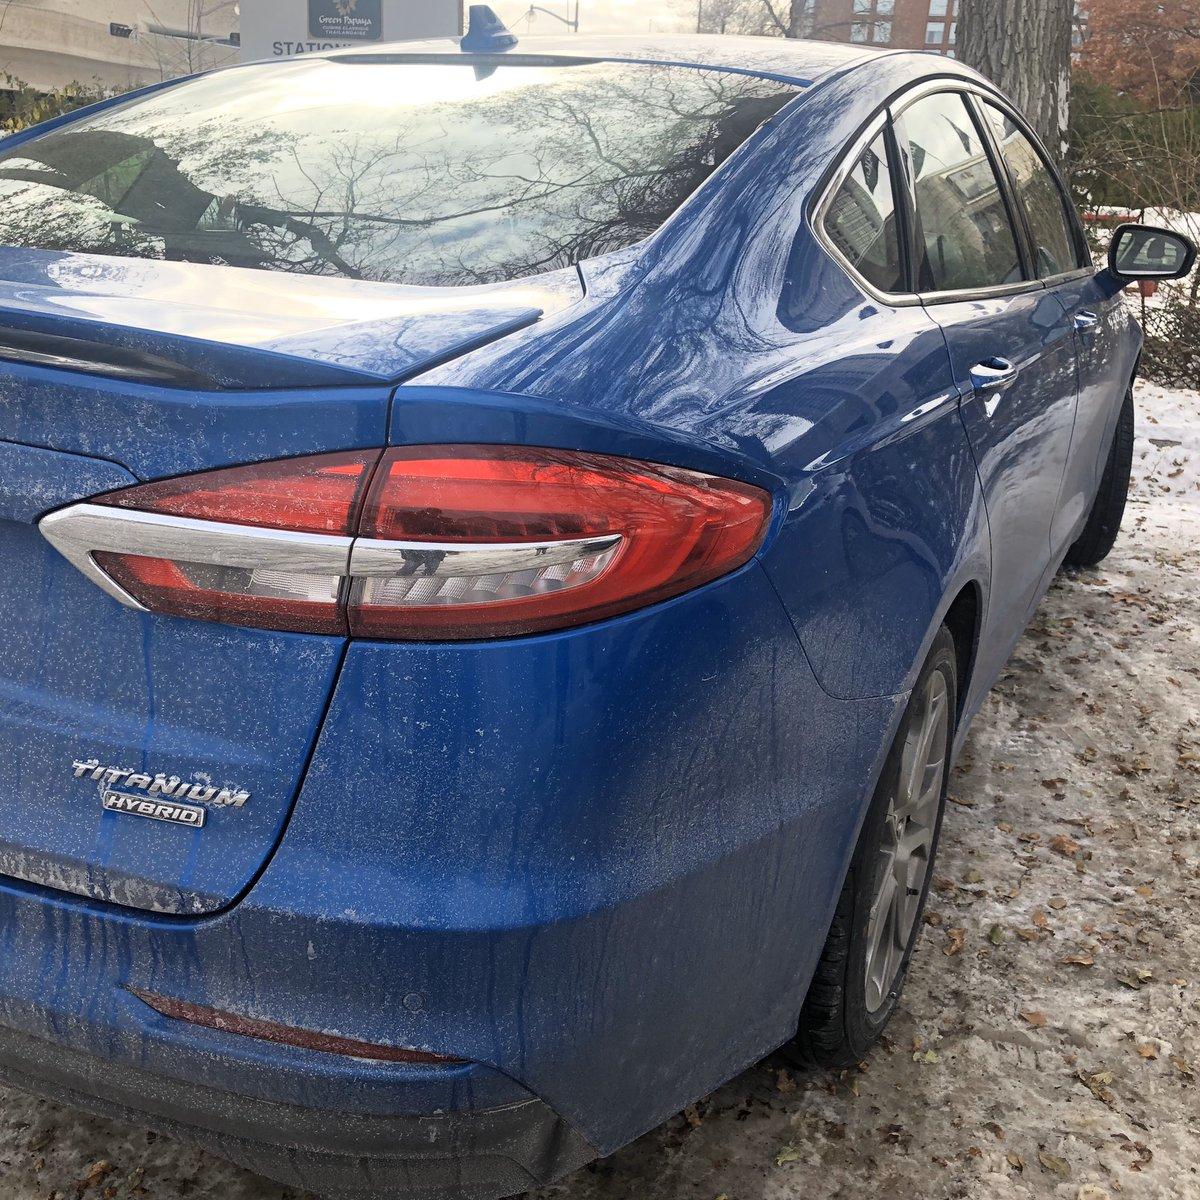 #F150 in service @Ford got #hybrid #fusion loaner https://t.co/rR3pkwFkmk